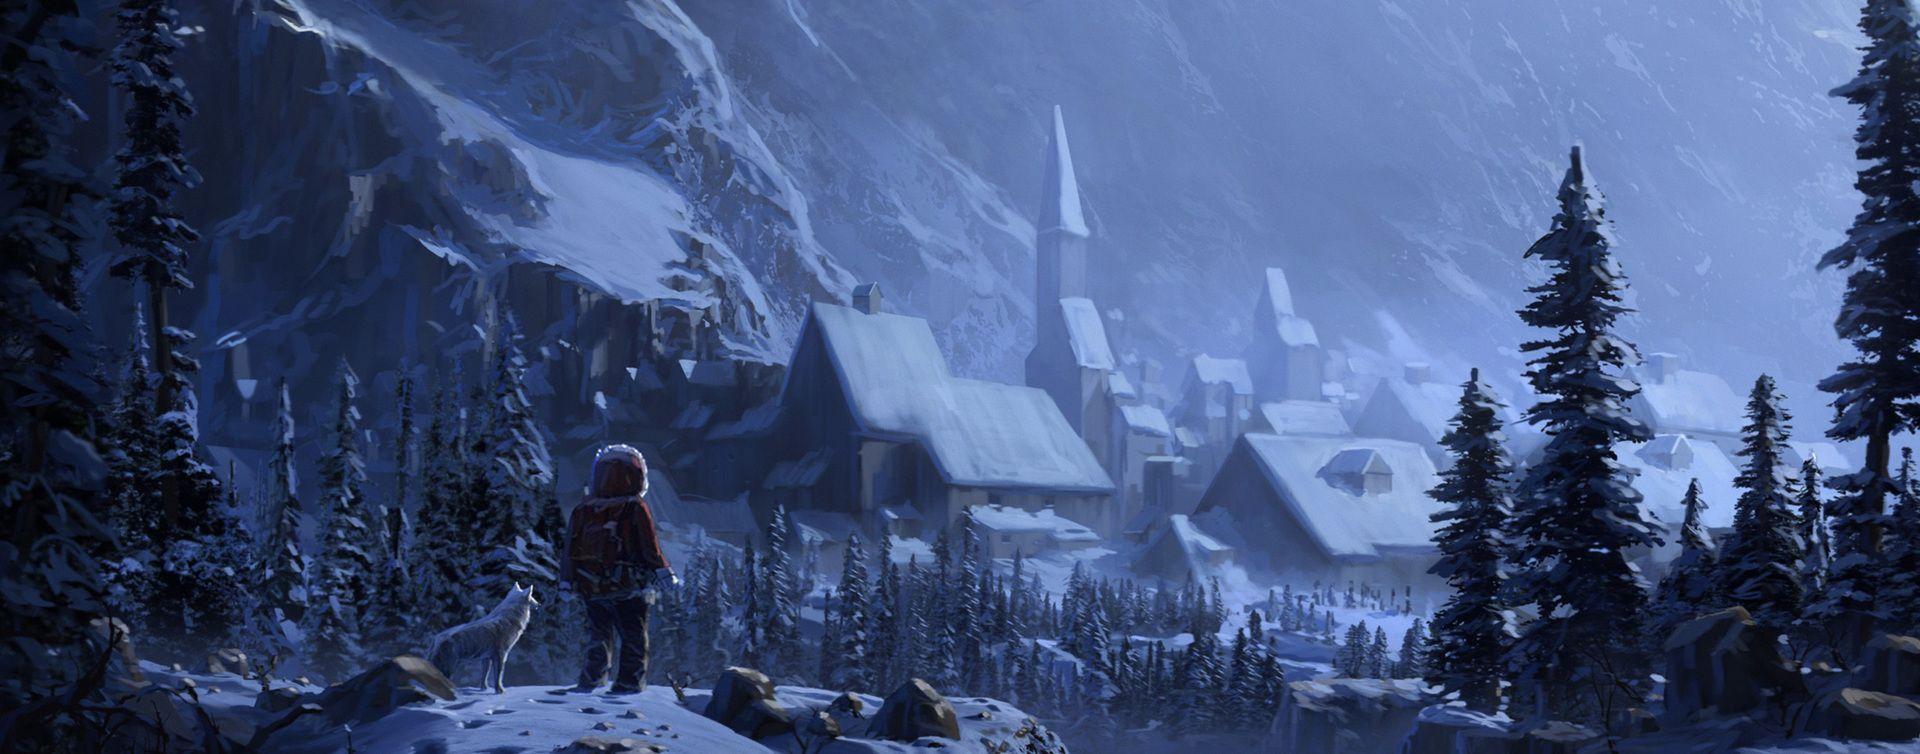 Fantasy Background Snow Art Action